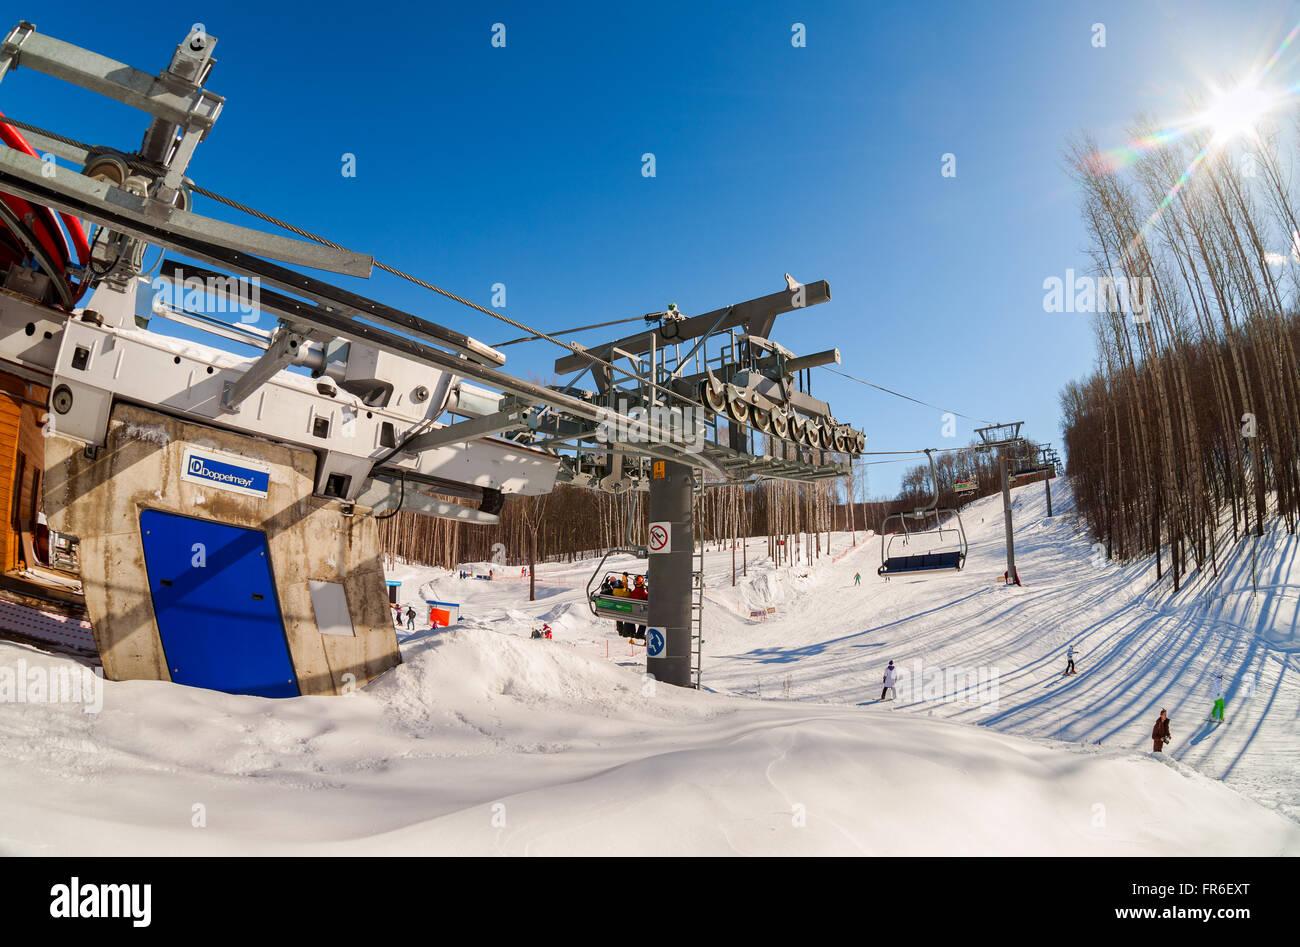 "Sesselbahn im Skigebiet ""Krasnaya Glinka"" Mountain in sonnigen Wintertag in Samara, Russland Stockbild"